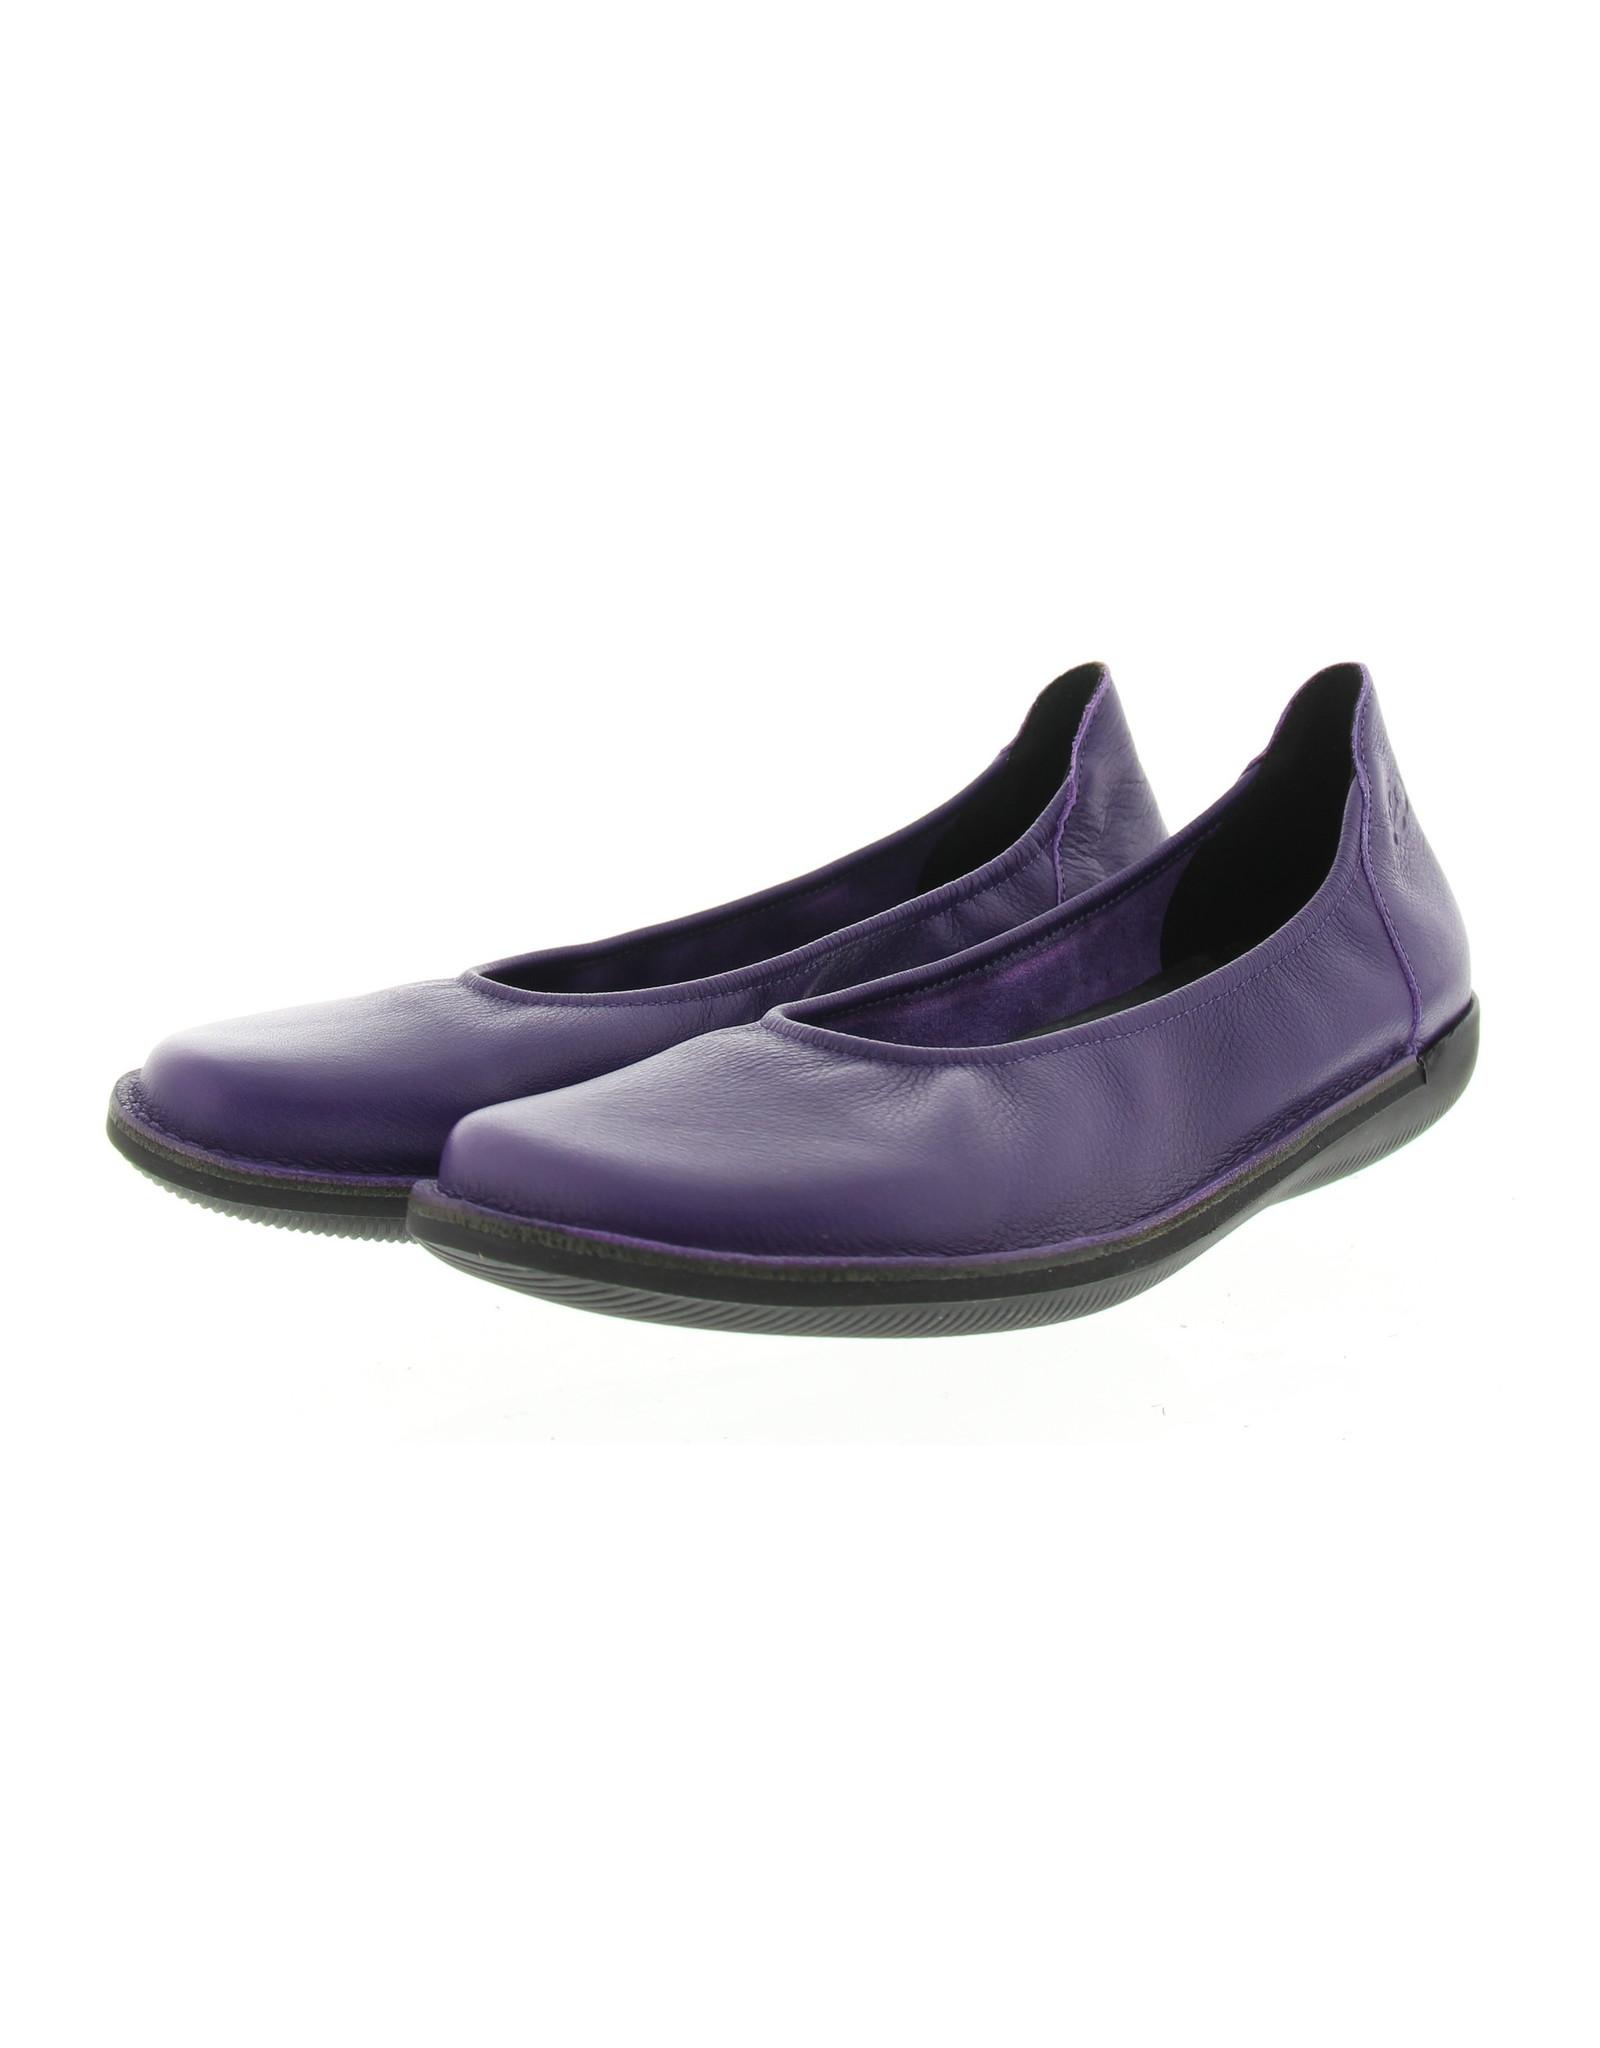 Loints Natural 68303 701 violet